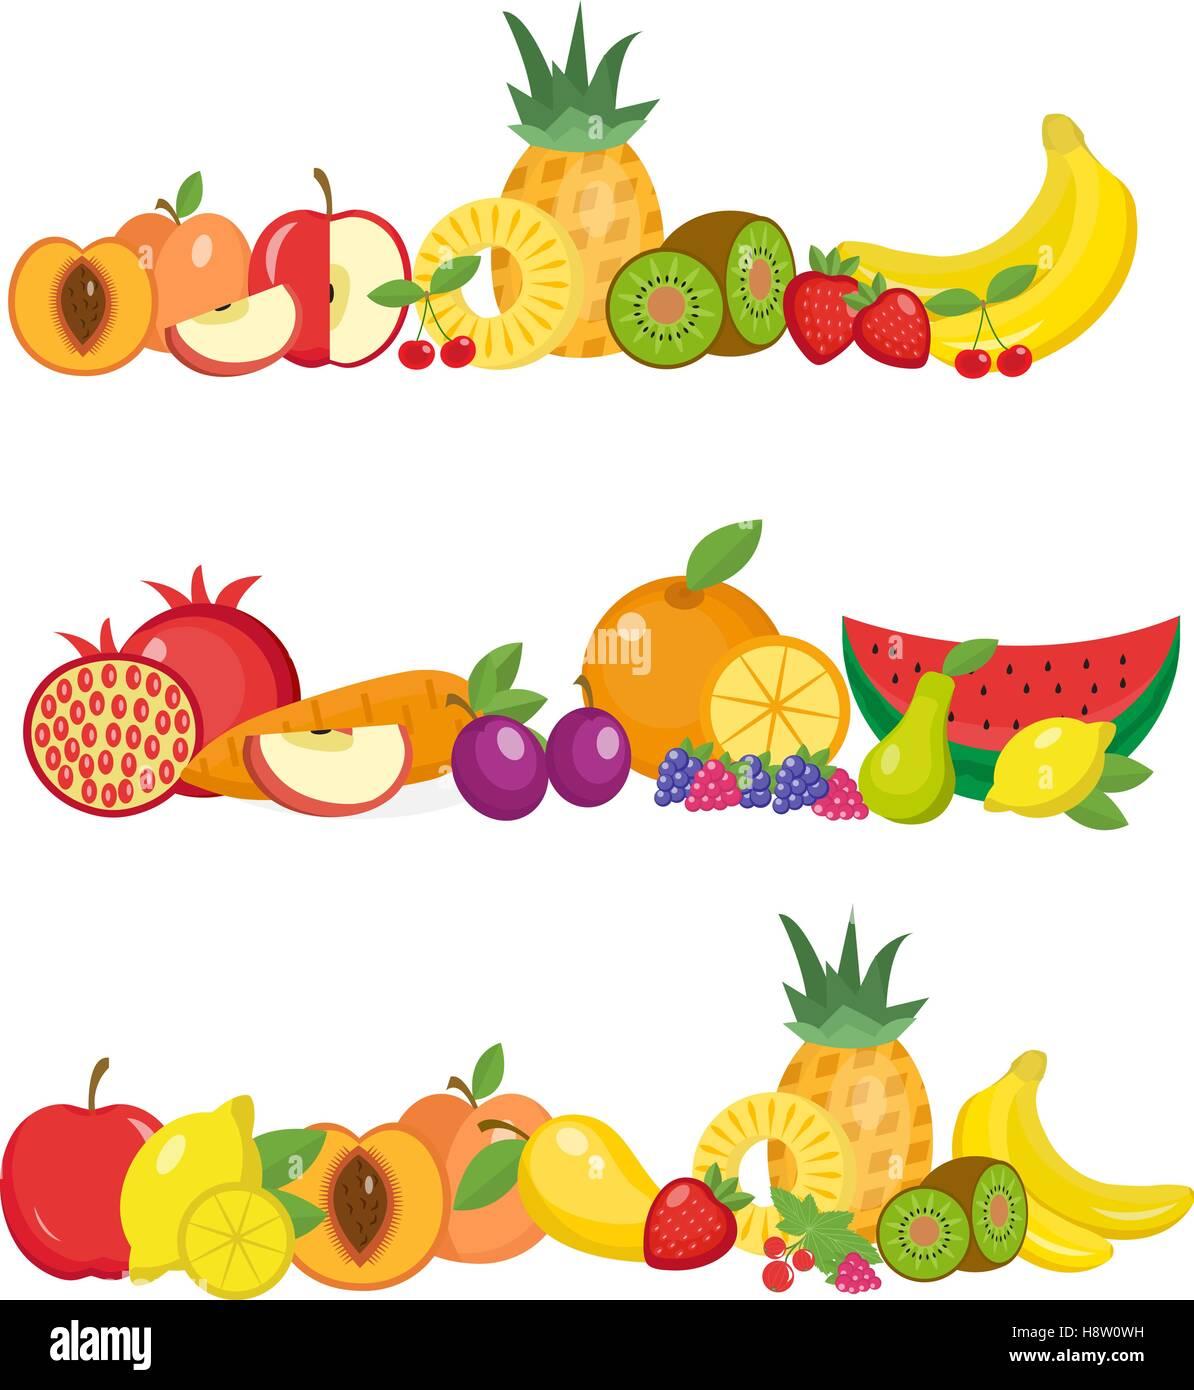 Healthy Food Banner Concept Illustration Stockfotos & Healthy Food ...